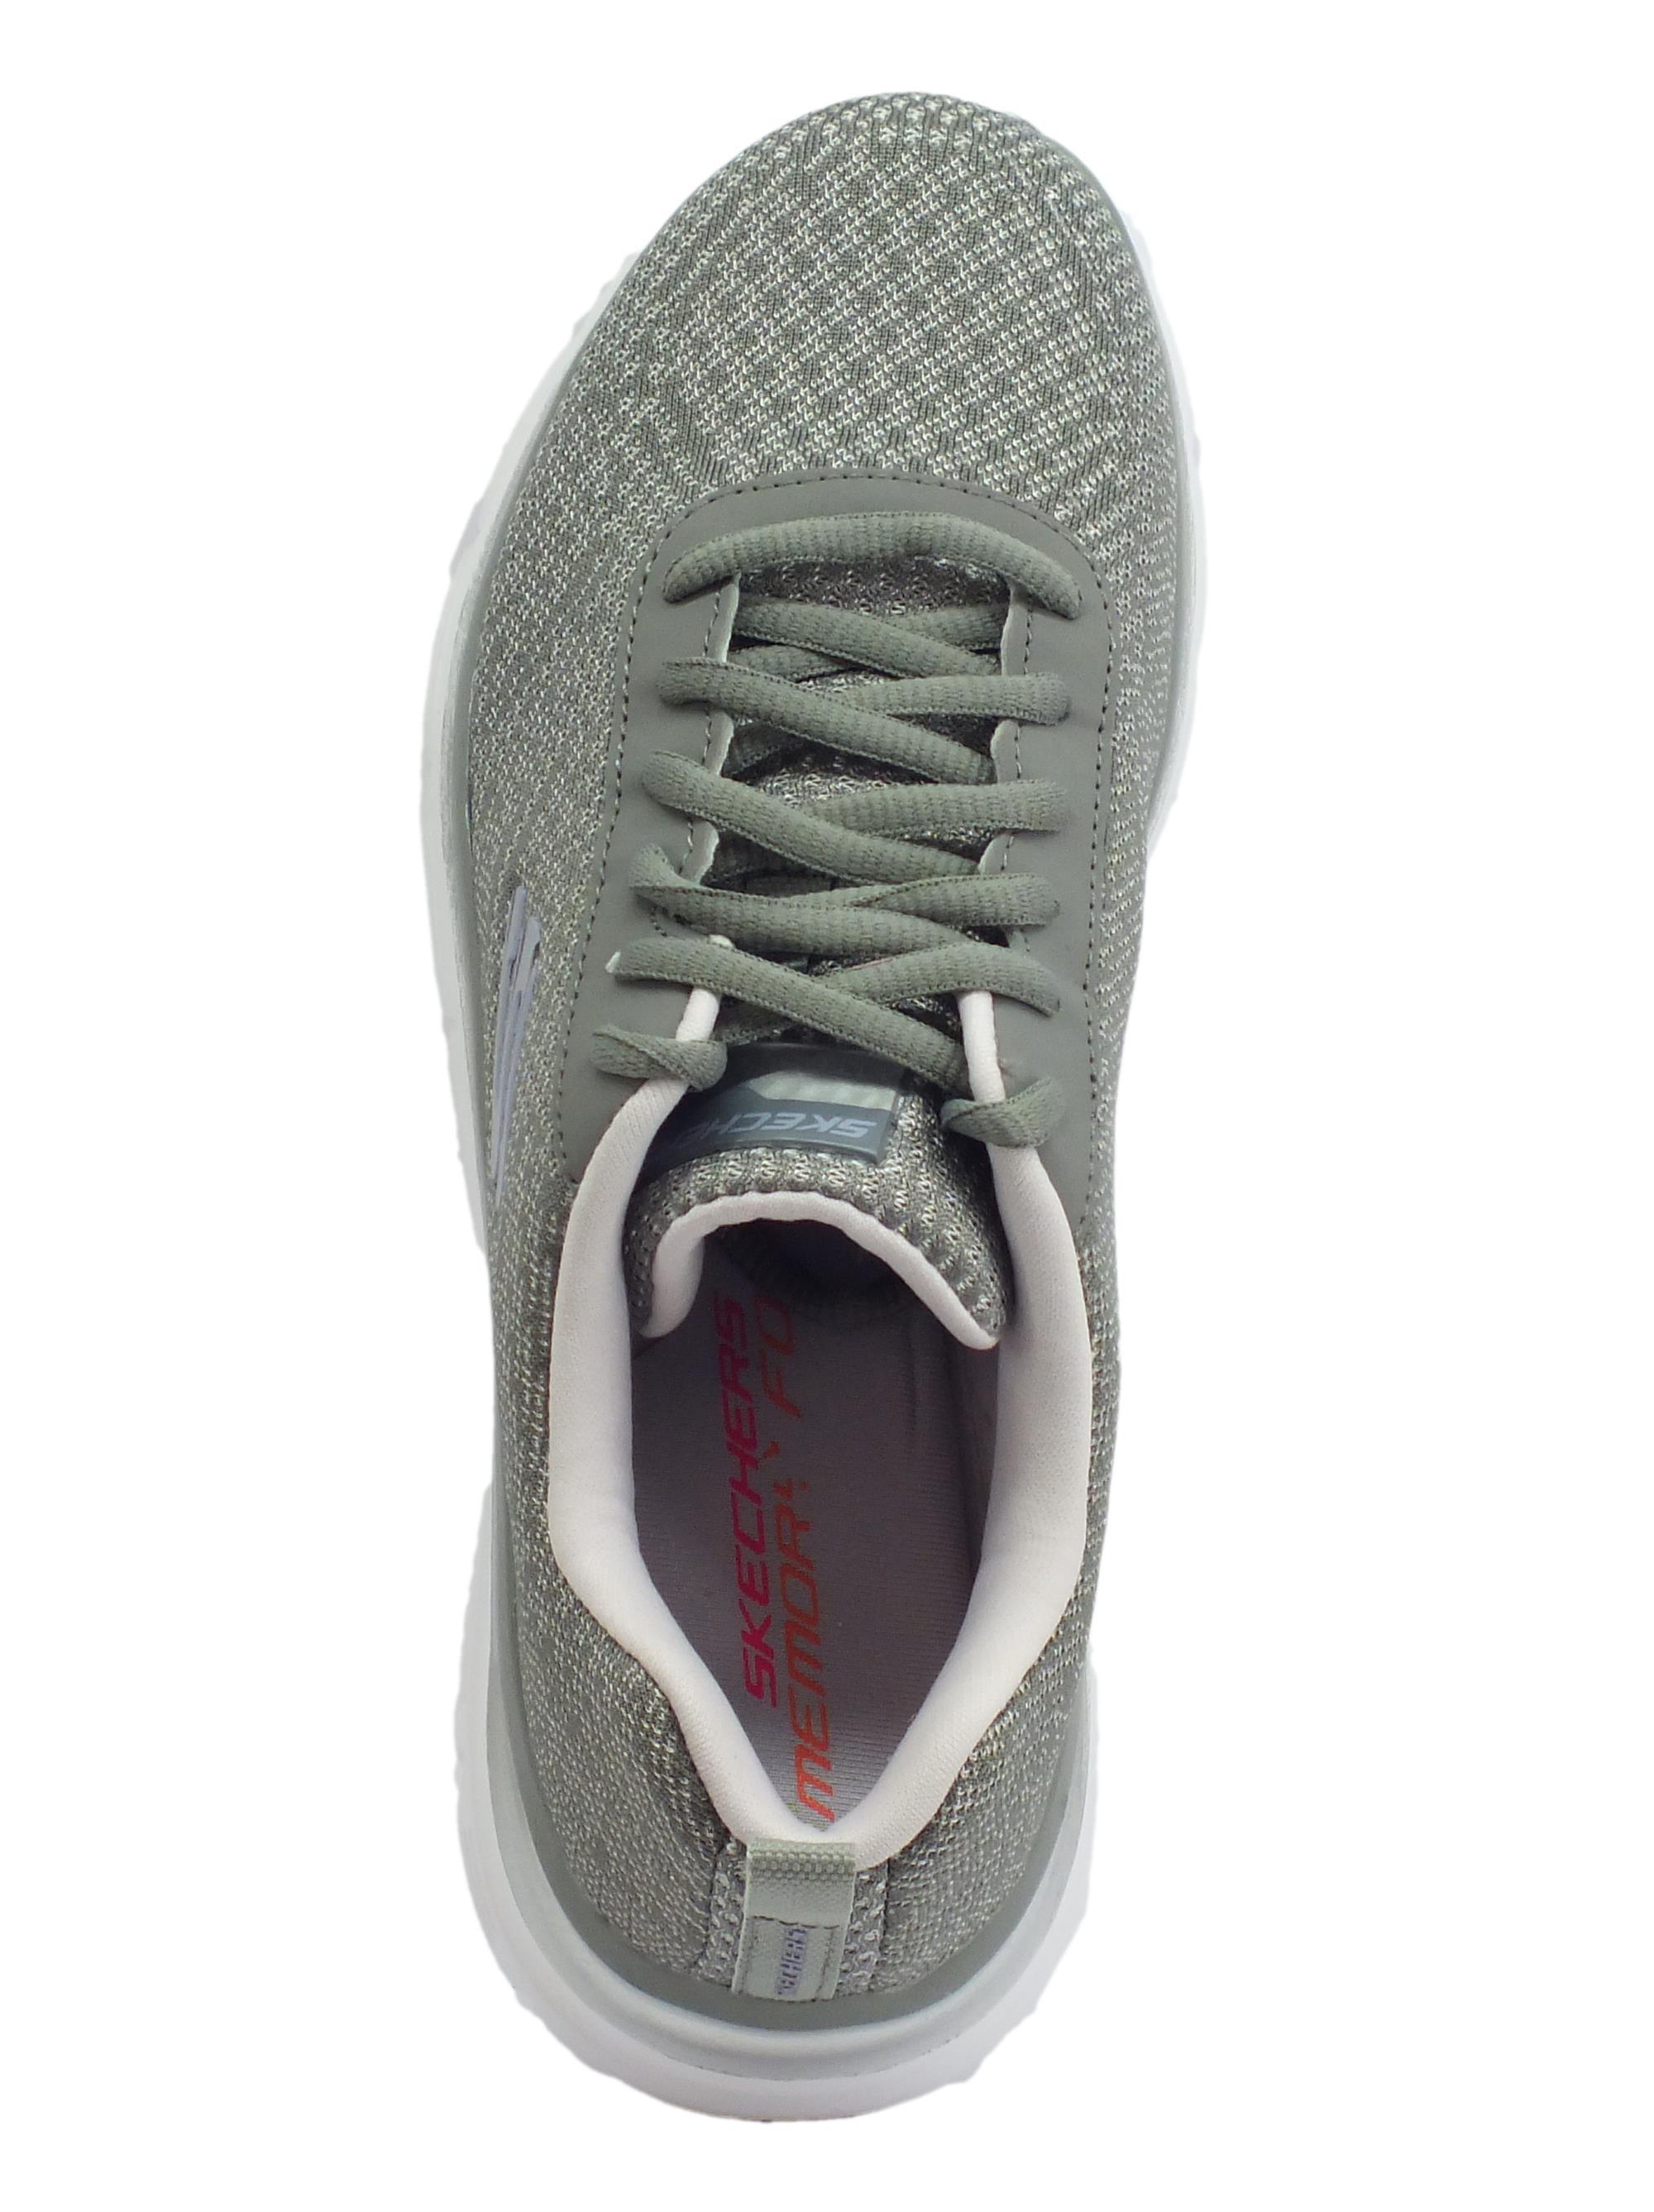 916a6a22c1d7e ... Skechers Fashion Fit Bold Boundaries Scarpe Sportive per donna grigie e  lavanda